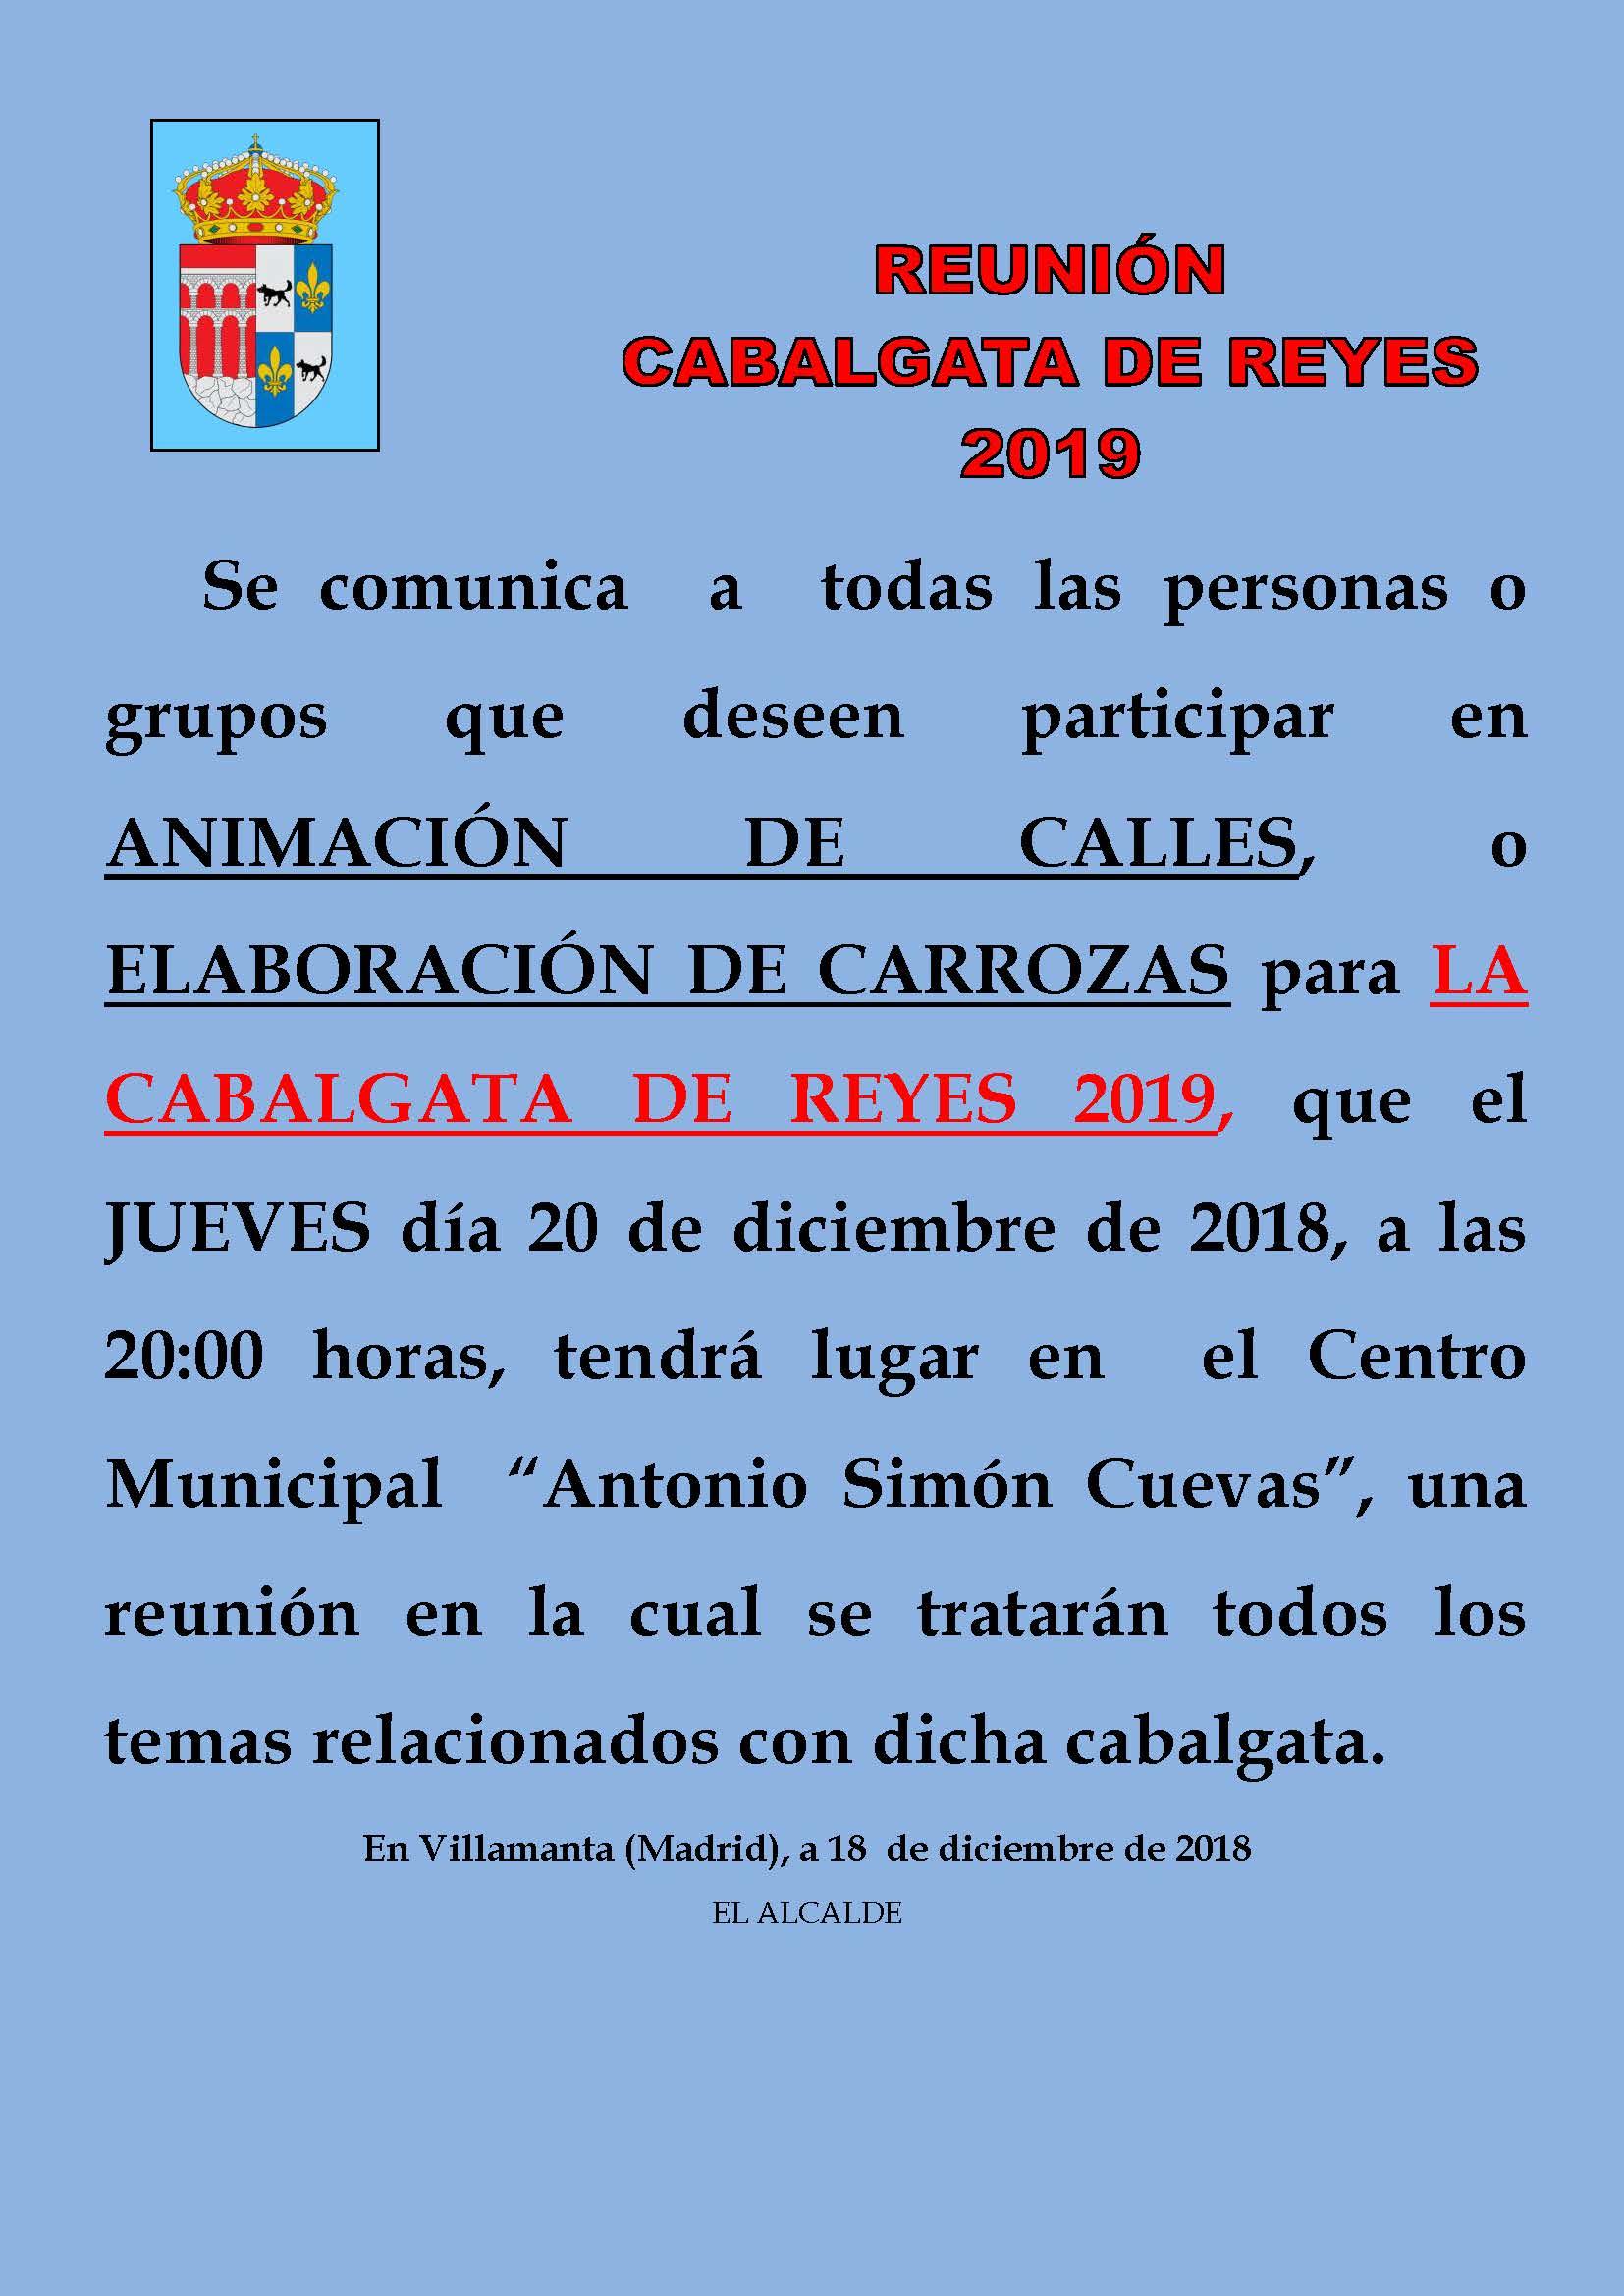 Reunion Cabalgata de reyes 2019